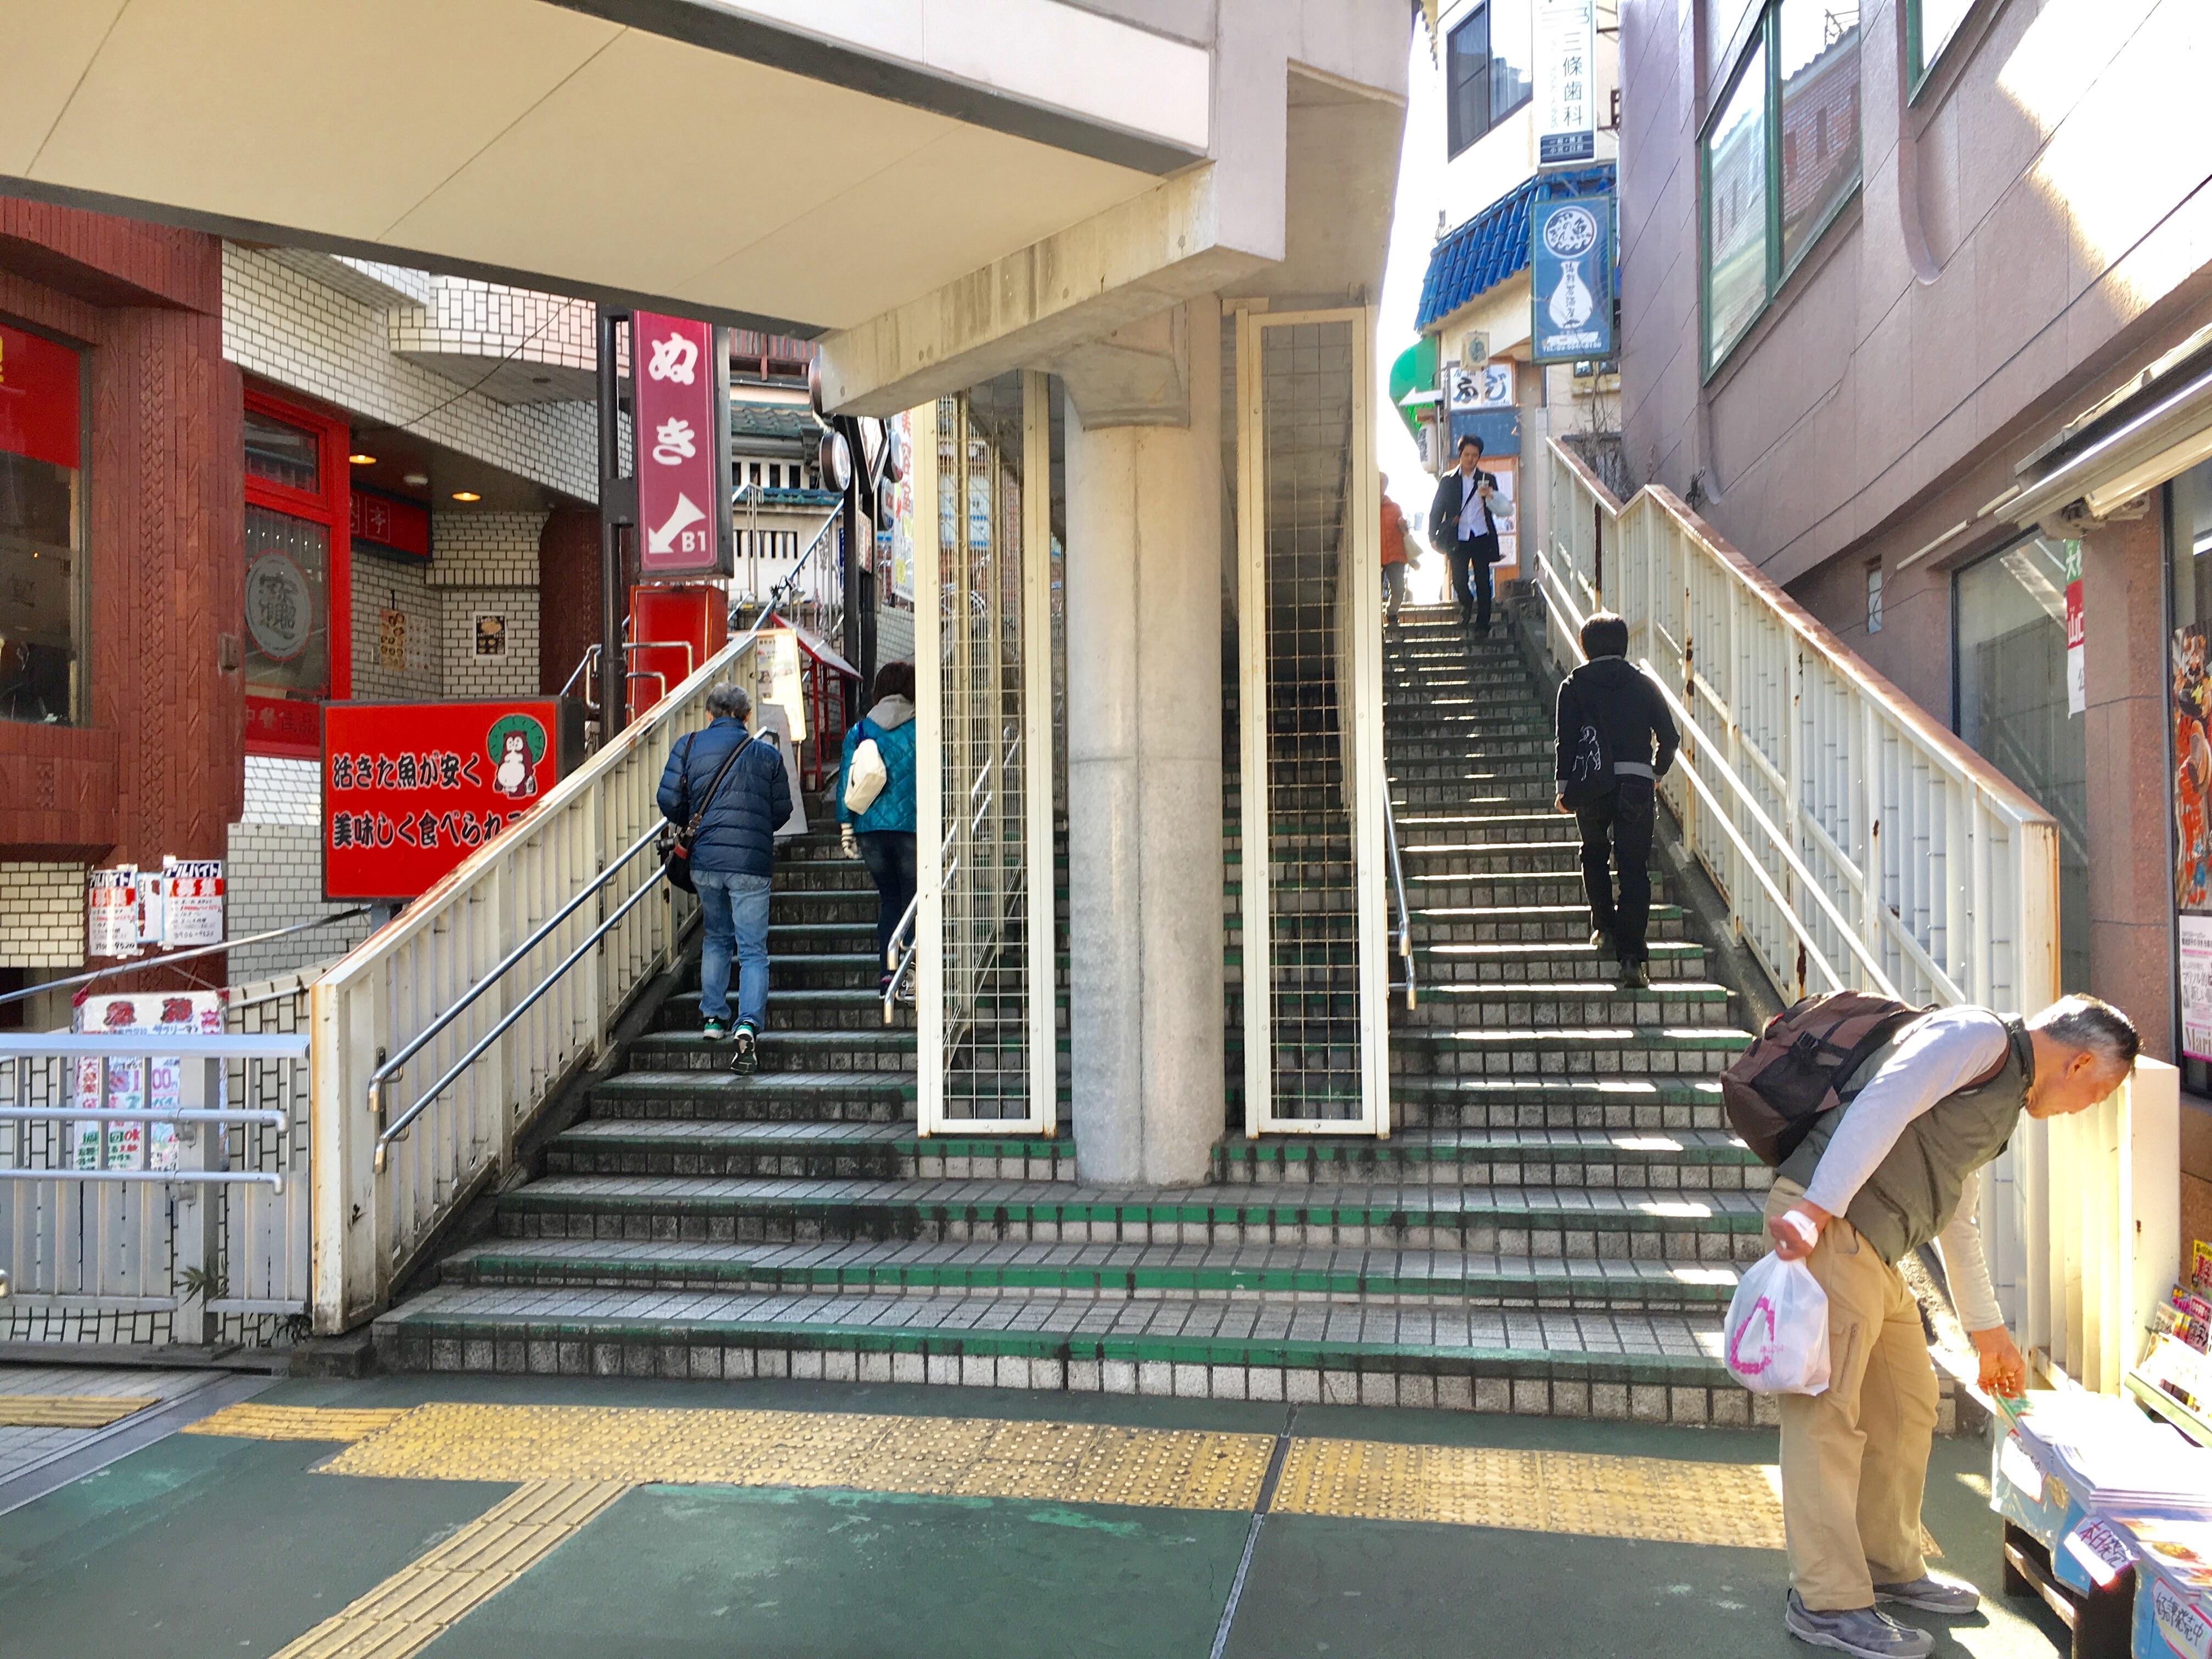 f:id:SoichiroIkeshita:20170316023208j:image